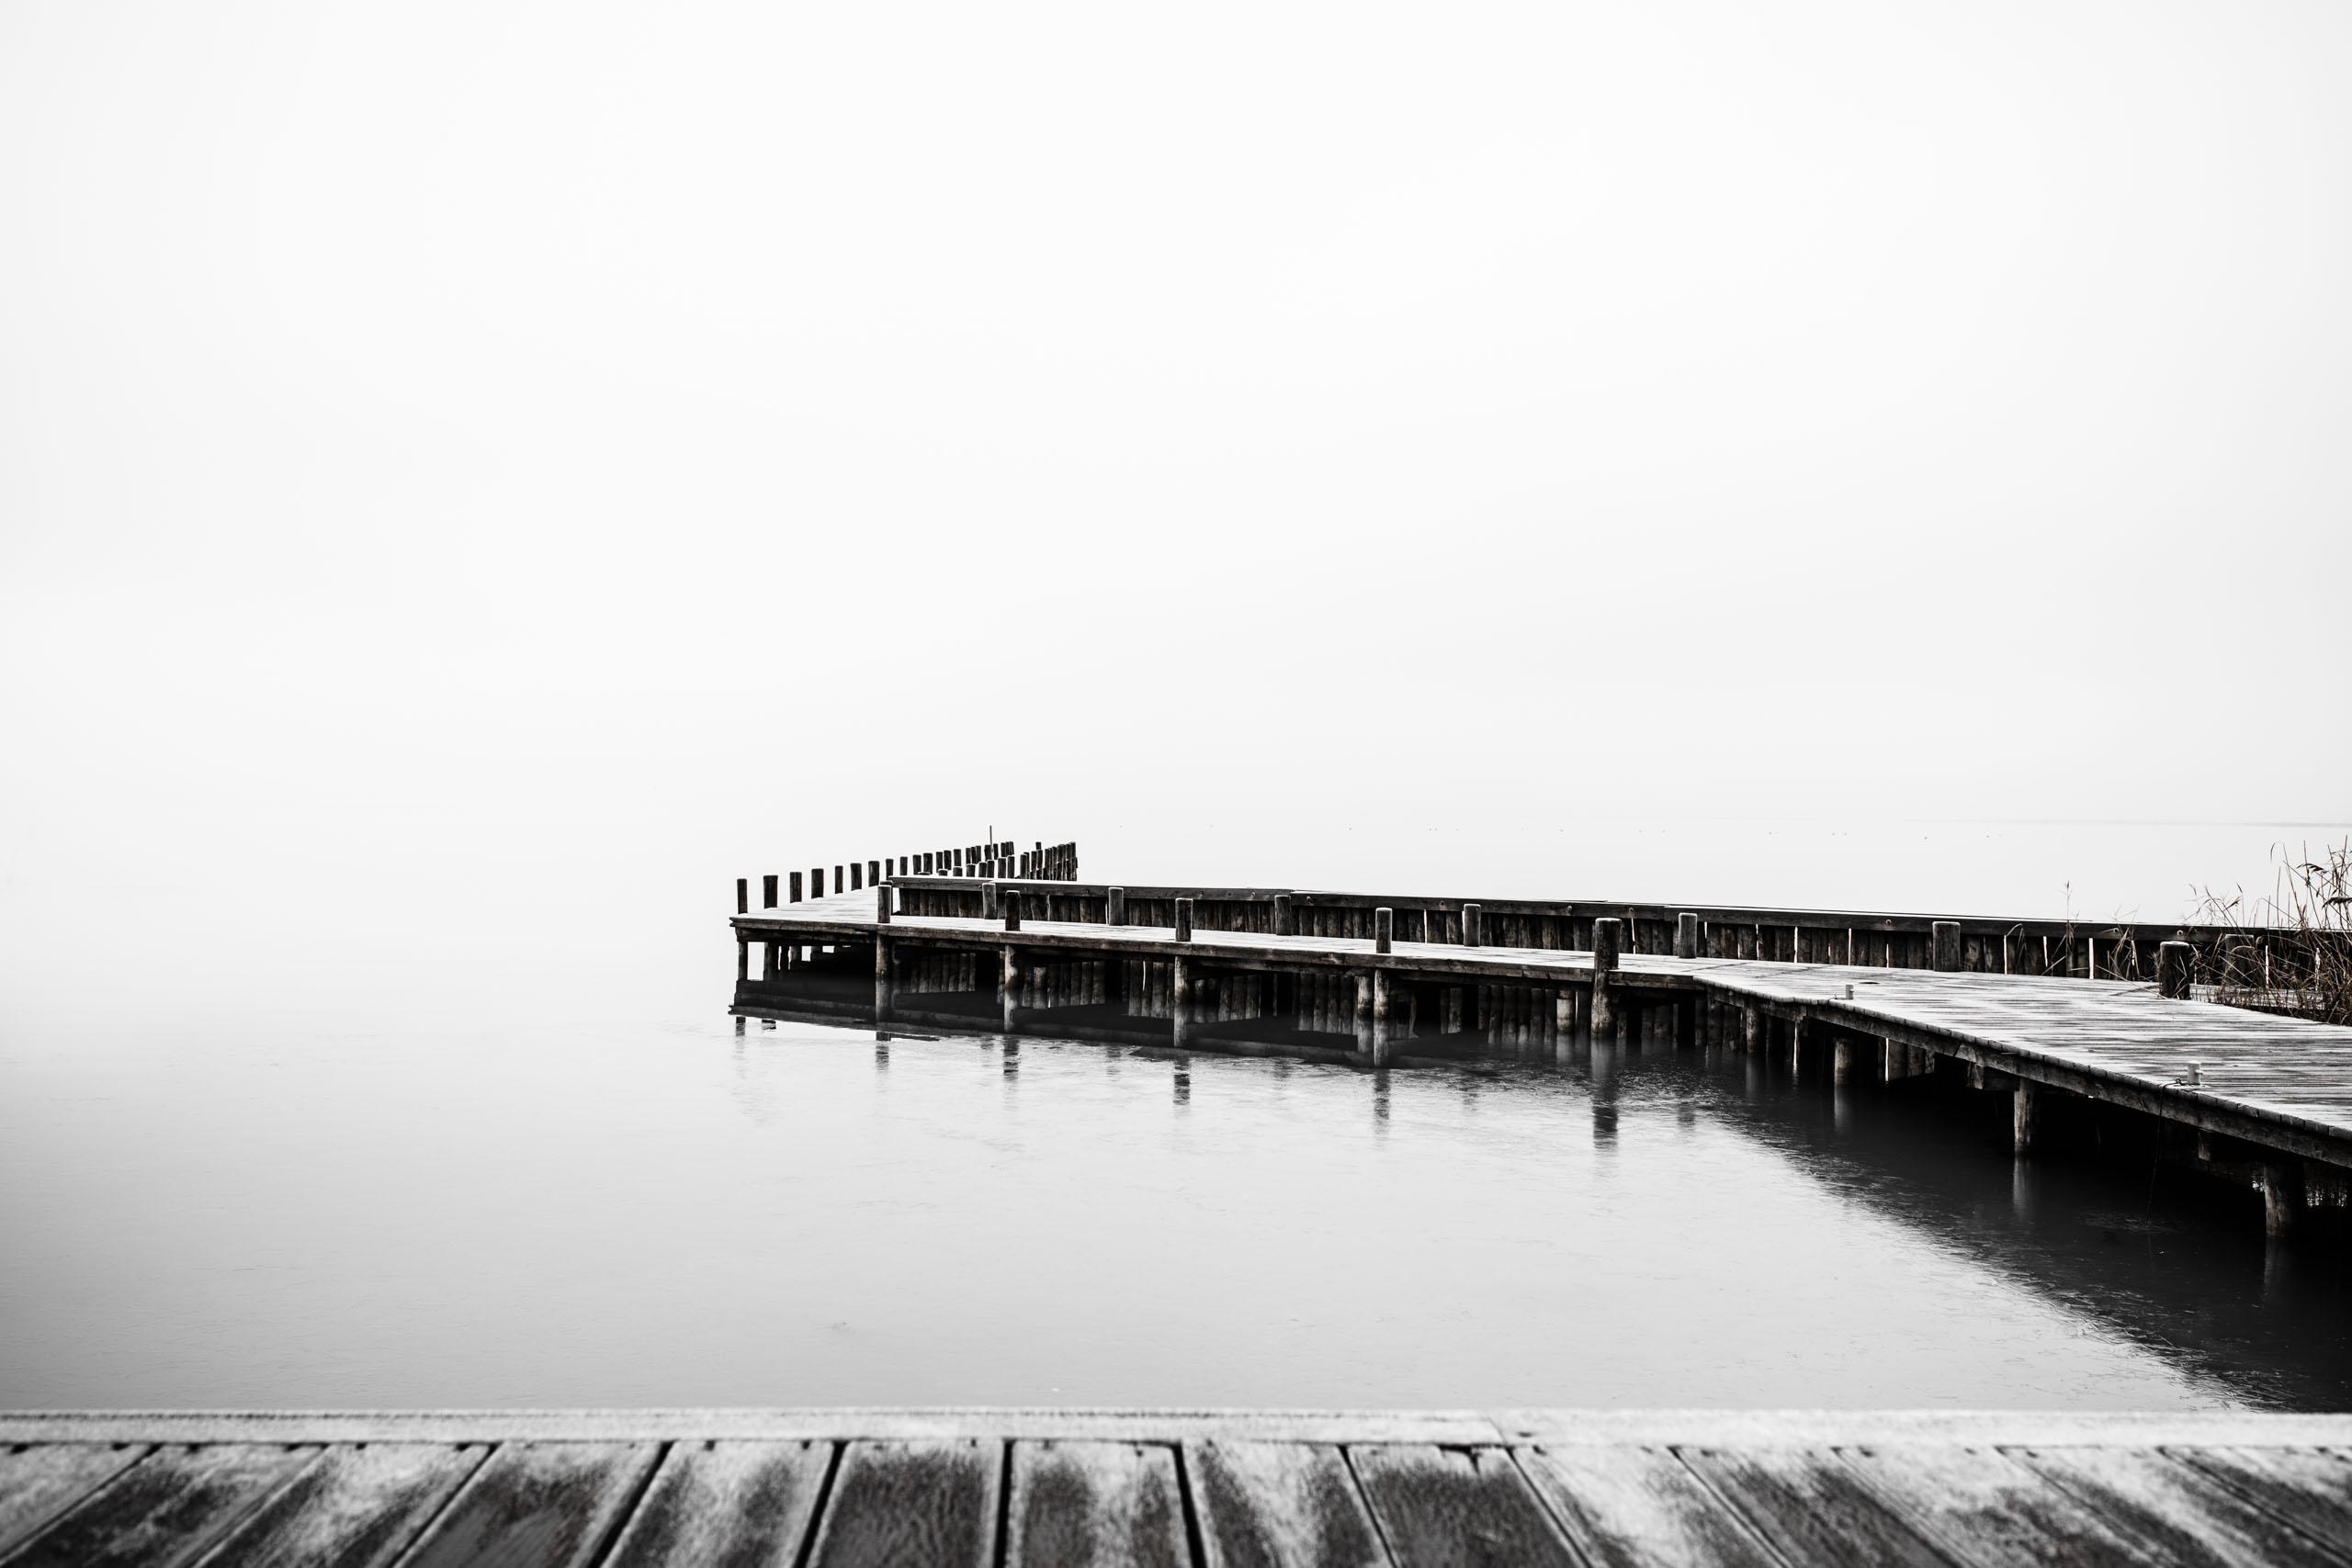 Am Neusiedlersee